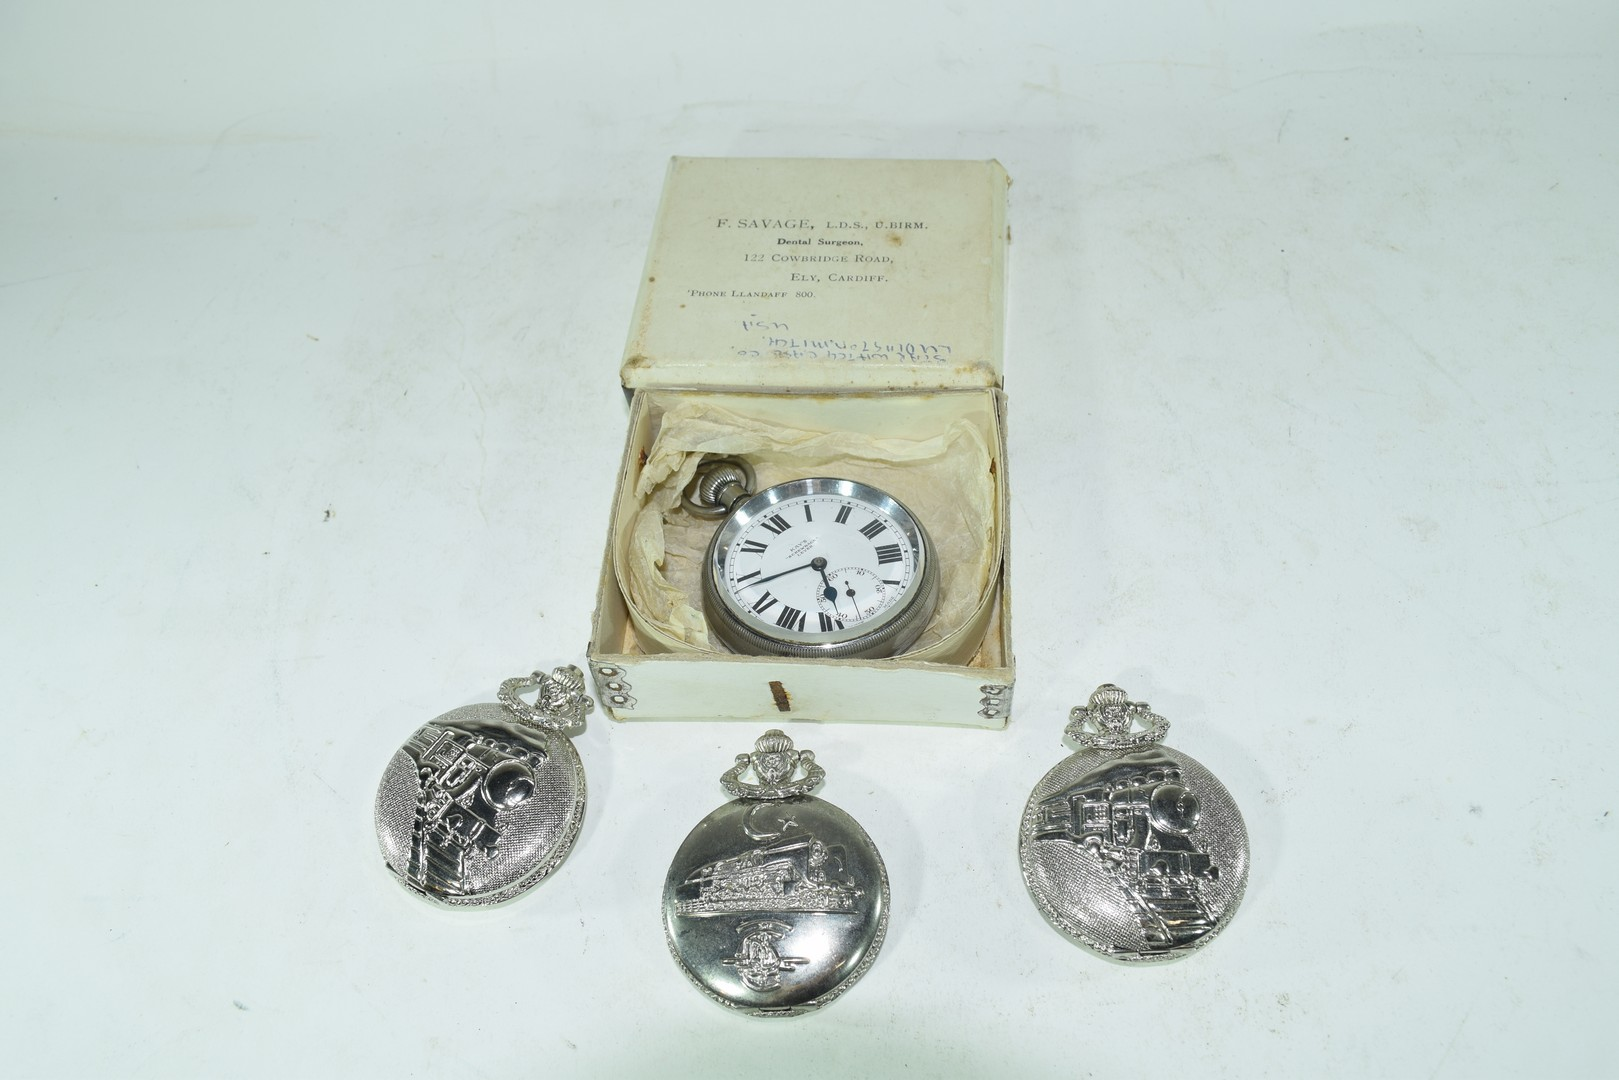 Cays screwback lever pocket watch